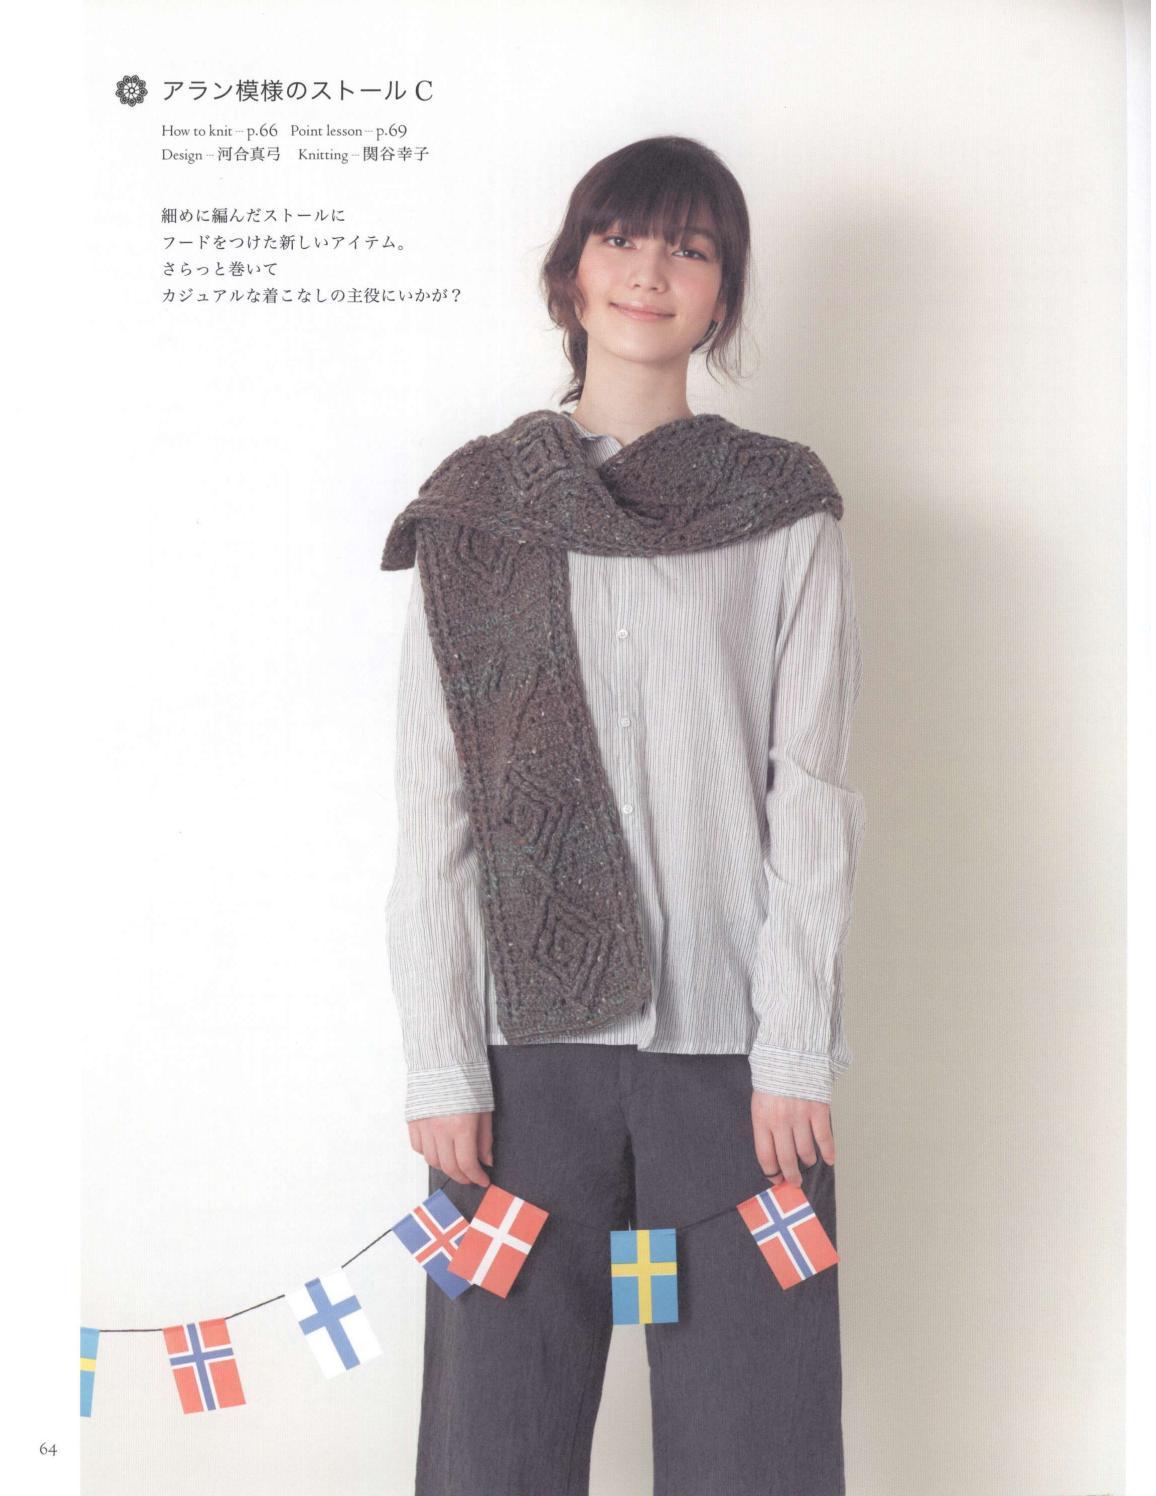 Asahi original crochet best selection 2012 page 64